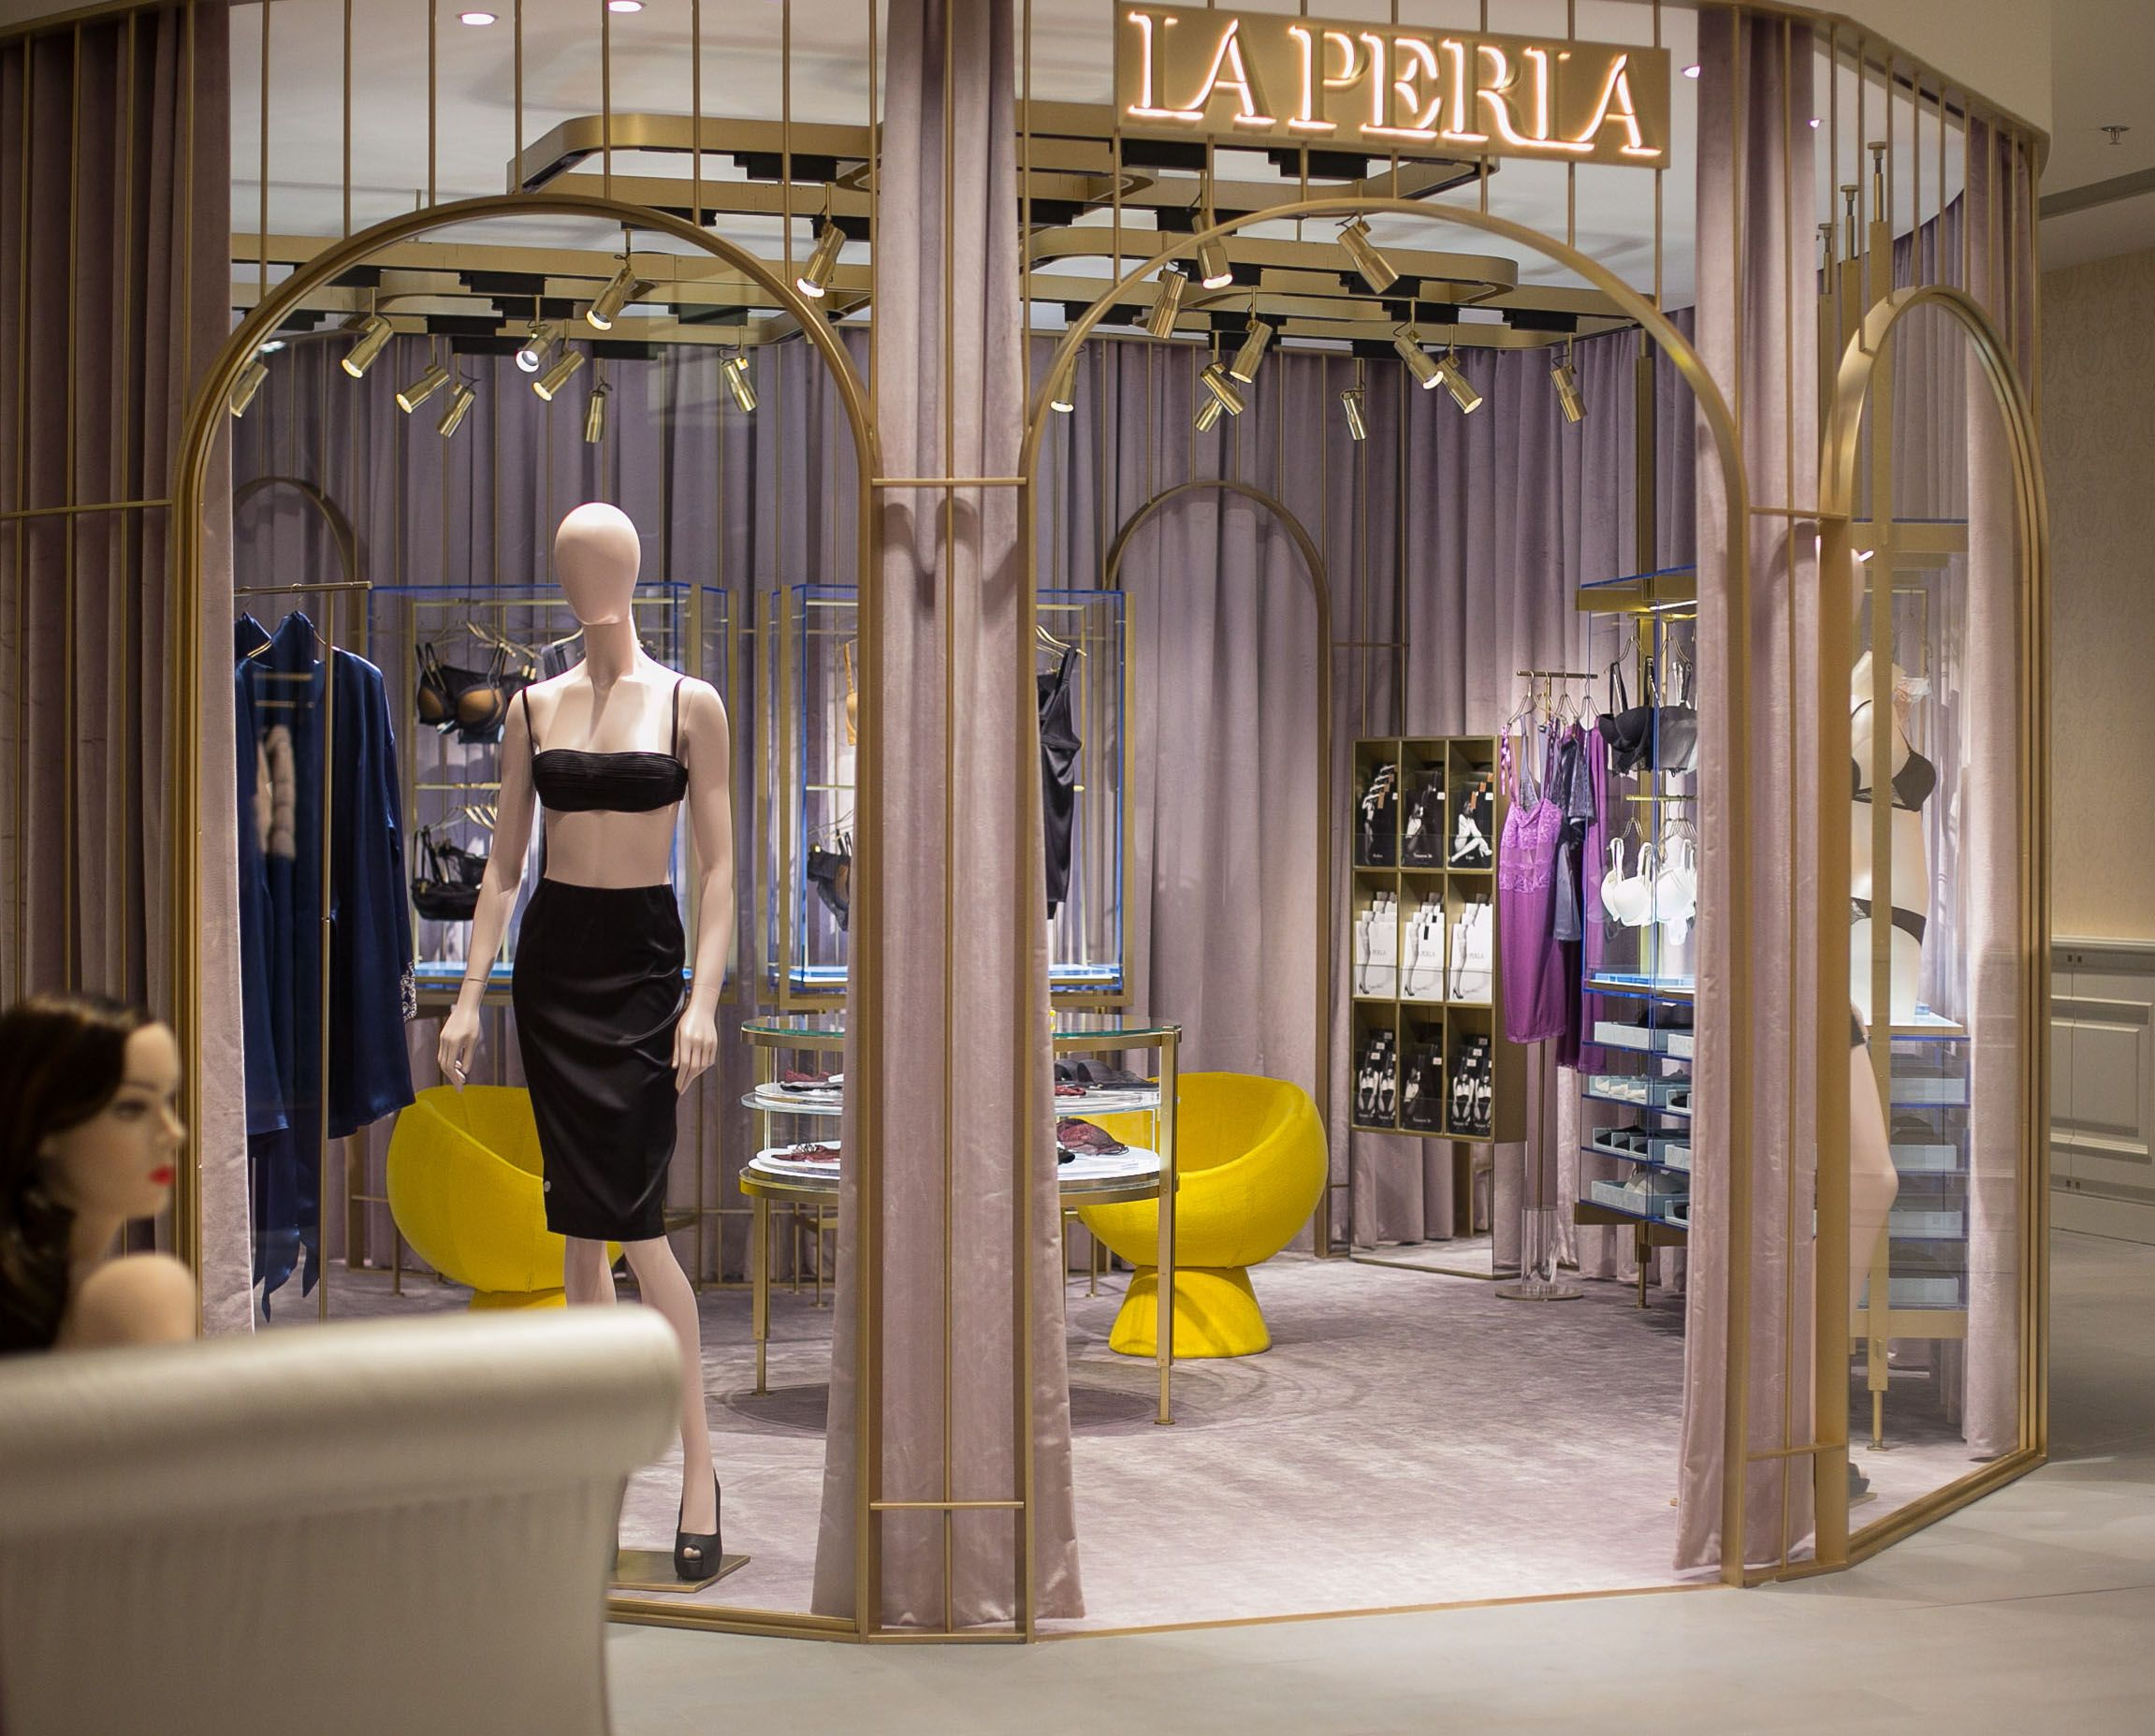 The New Concept La Perla Boutique In Emporium DeptStore Baku Azerbaijan